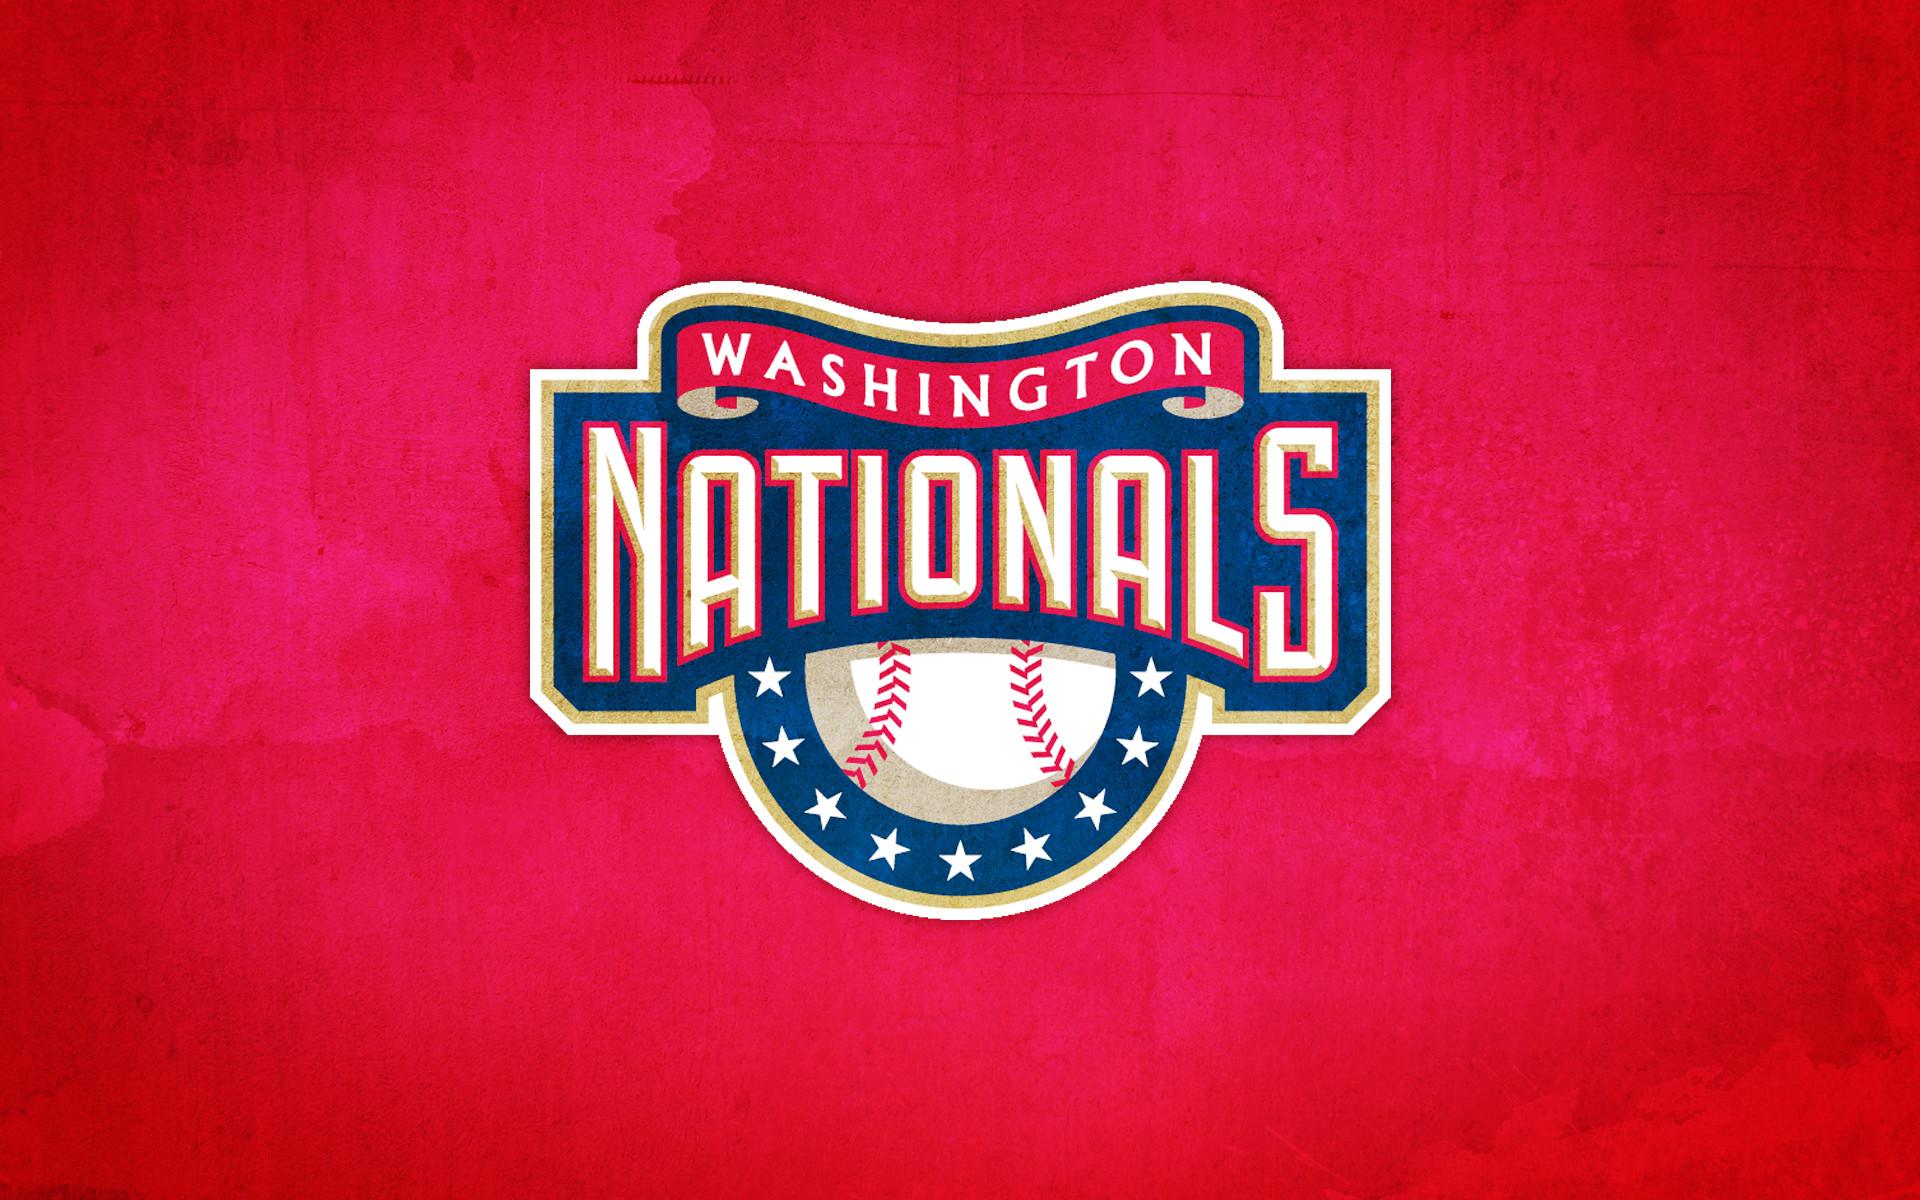 Washington Nationals | 1920 x 1200 | 1024 x 640